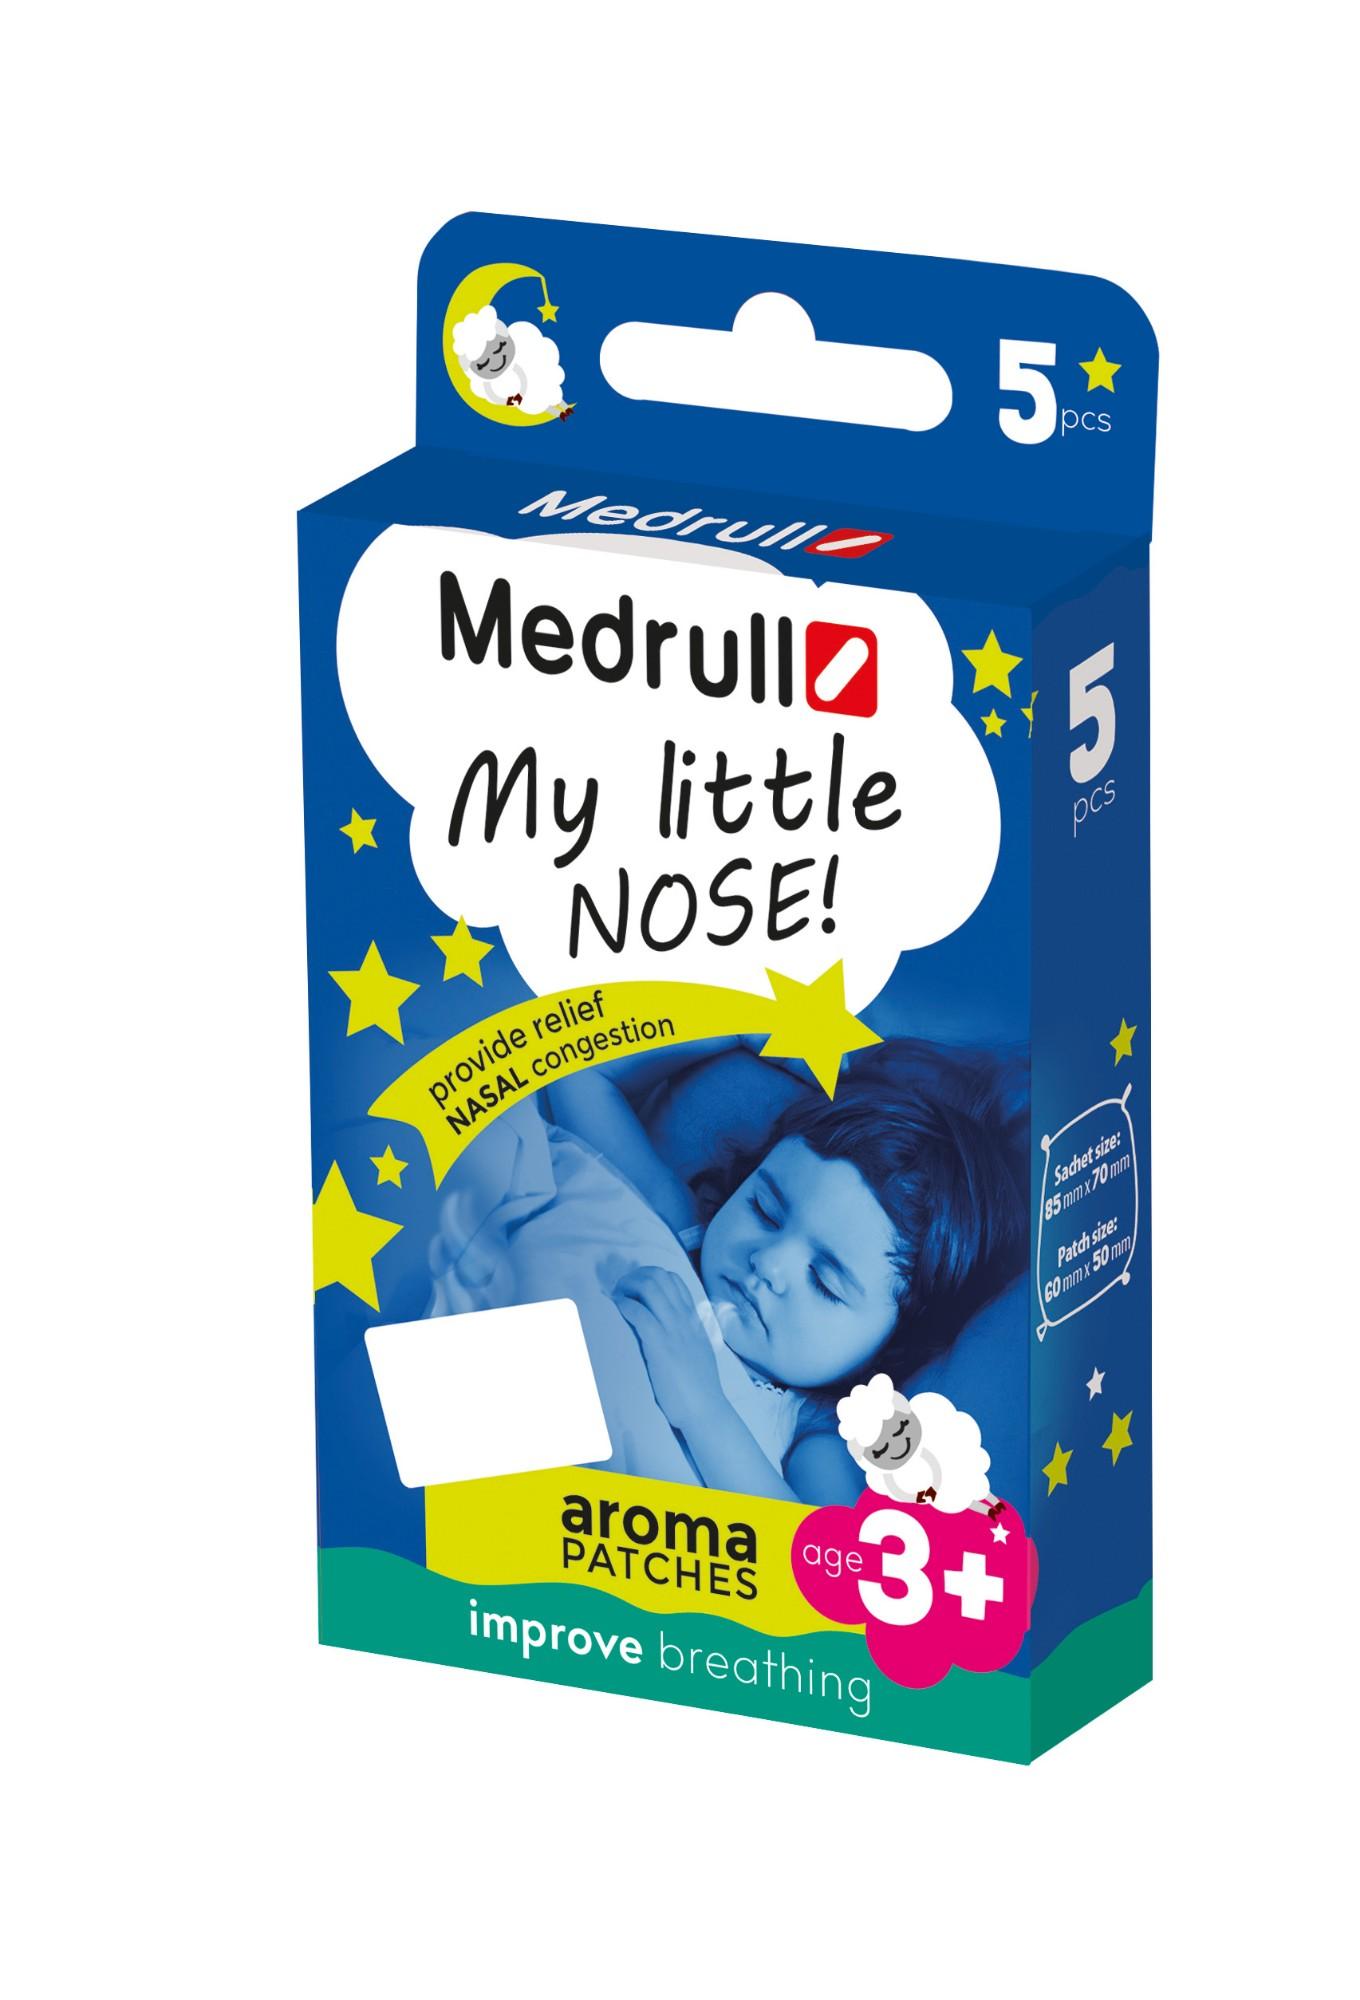 Kvėpavimo pleistras MEDRULL My little nose vaikams nuo 2 metų, 5 vnt.